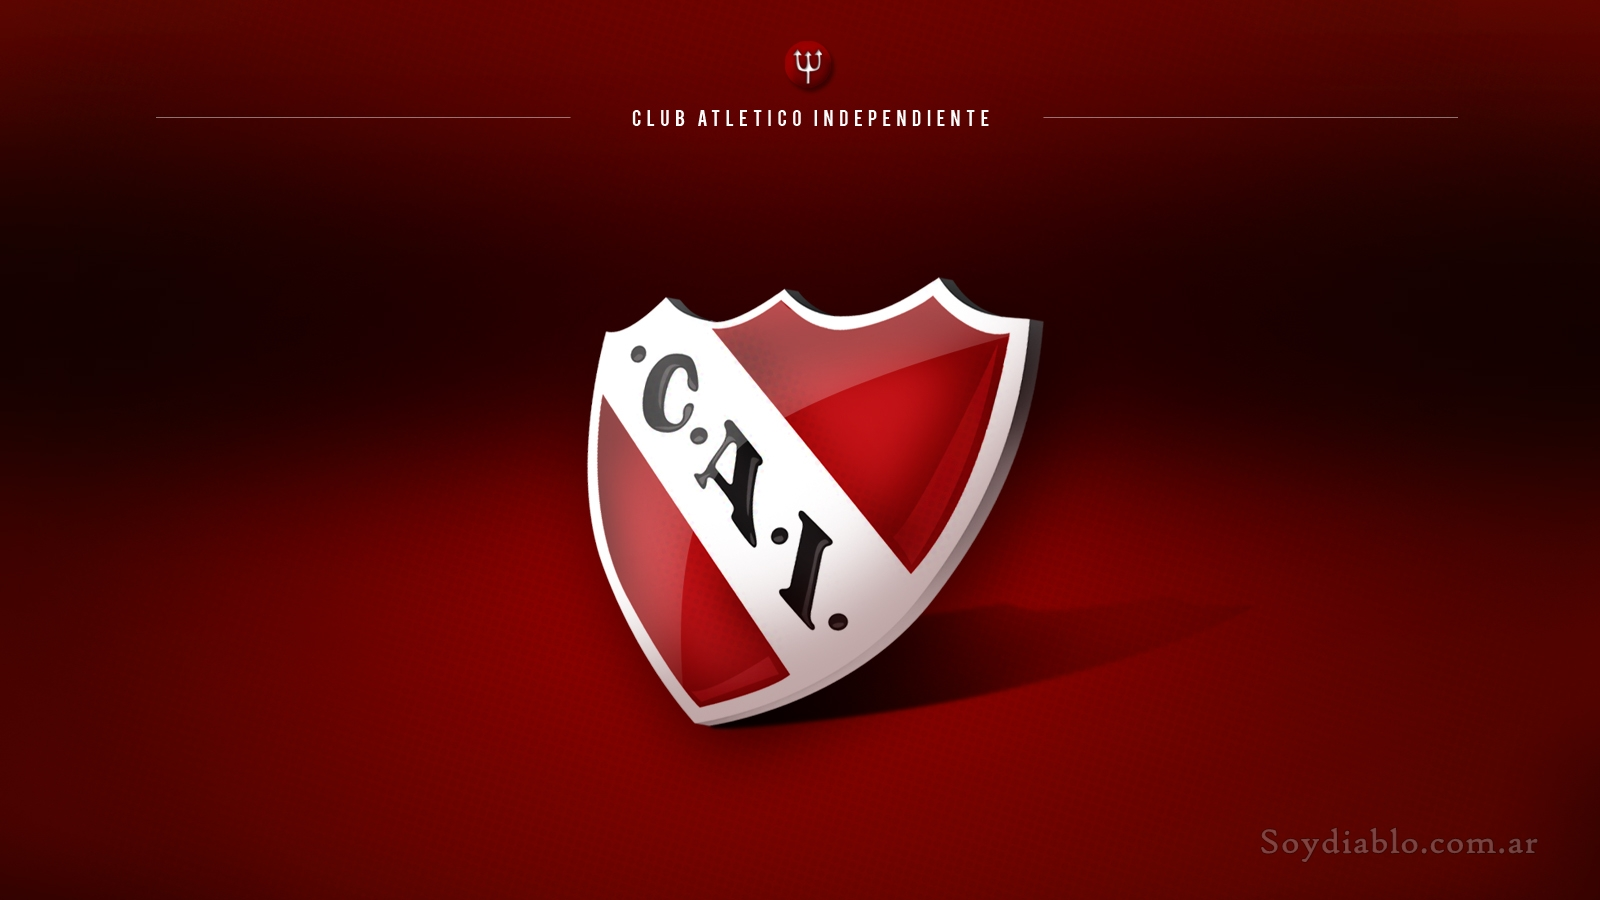 independiente foot ball club: